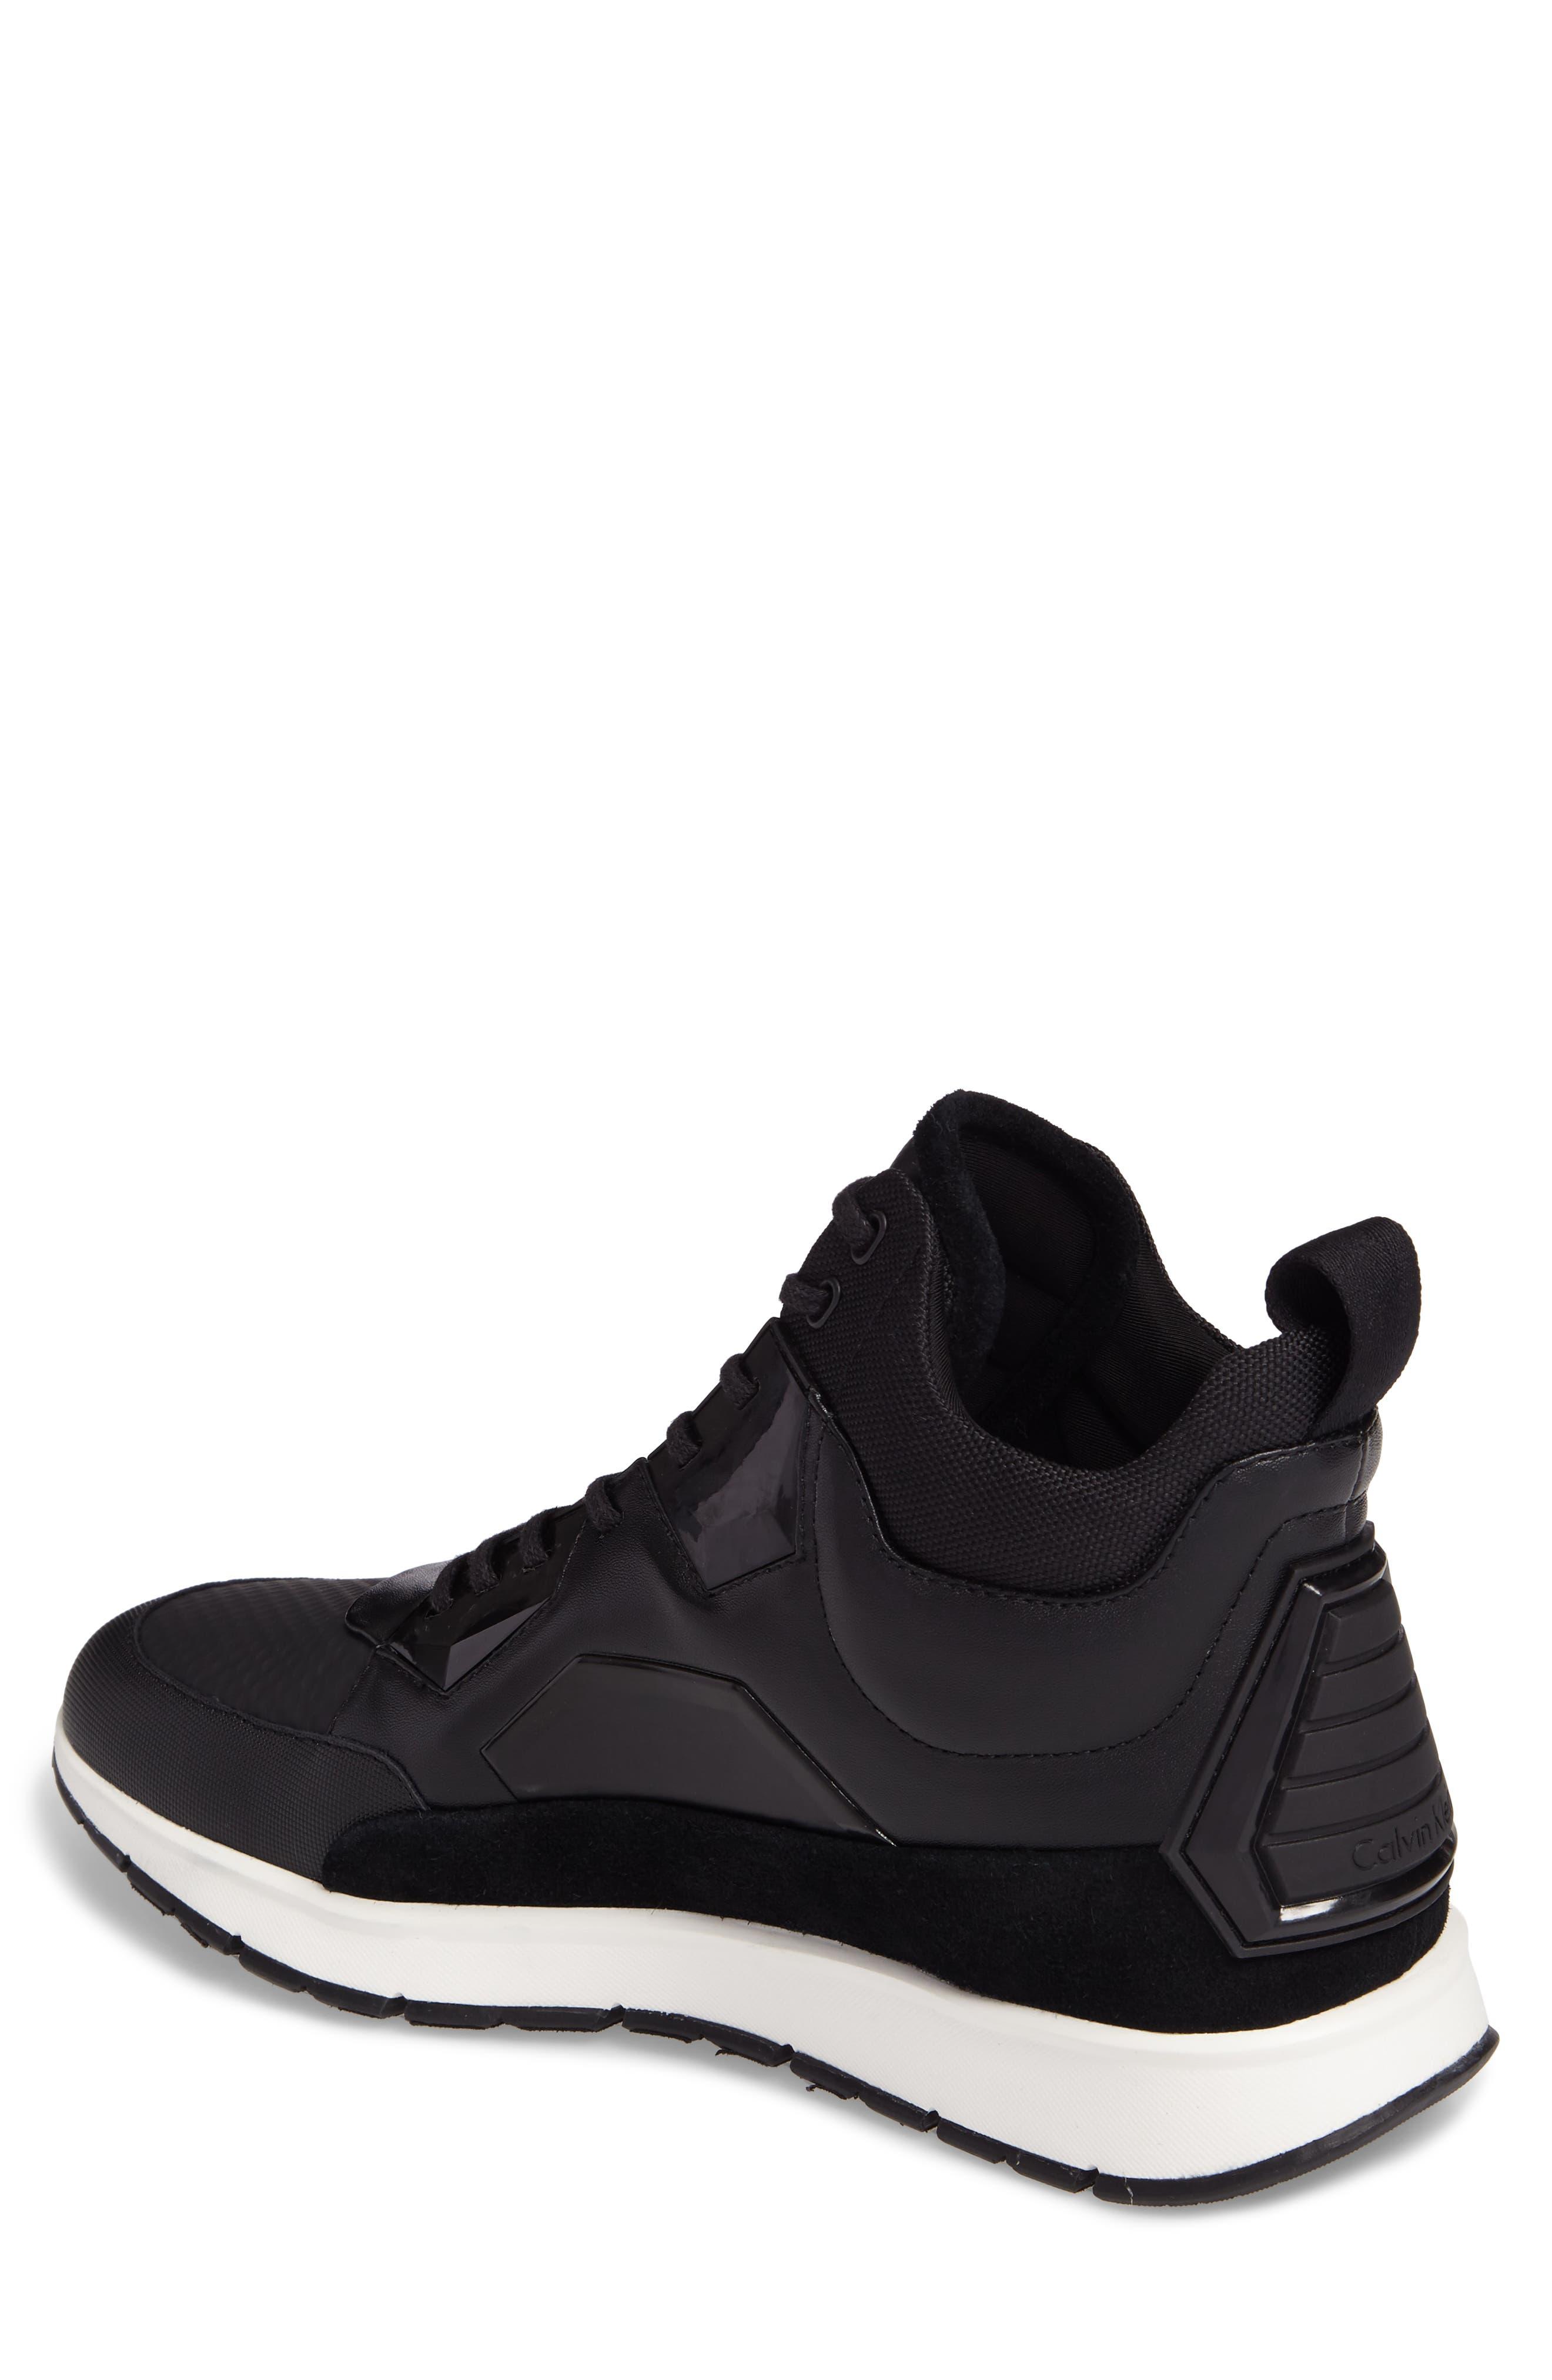 Kovan City Sneaker,                             Alternate thumbnail 2, color,                             001